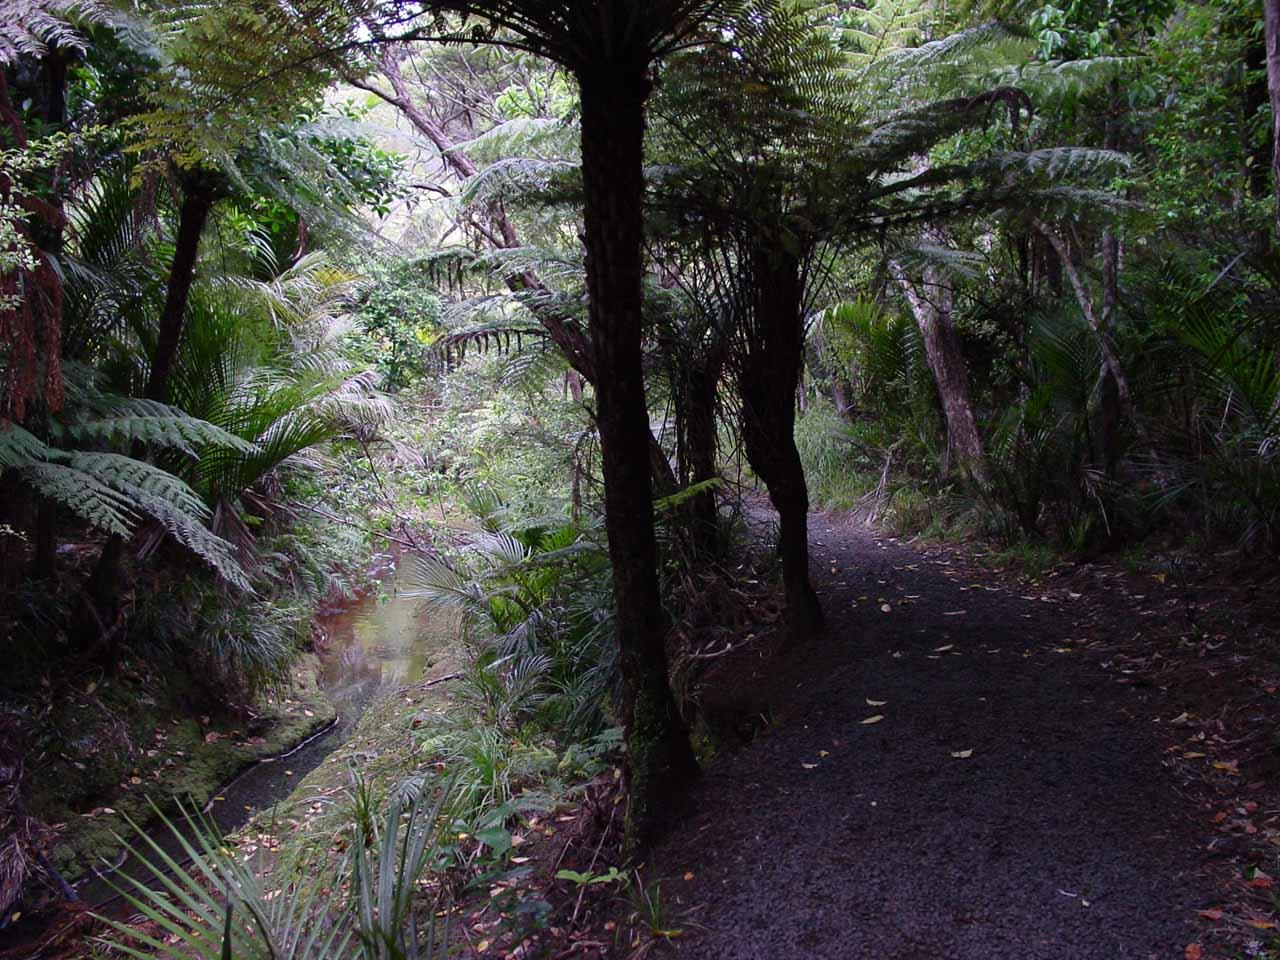 The track to Kitekite Falls then followed along the Glenesk Stream